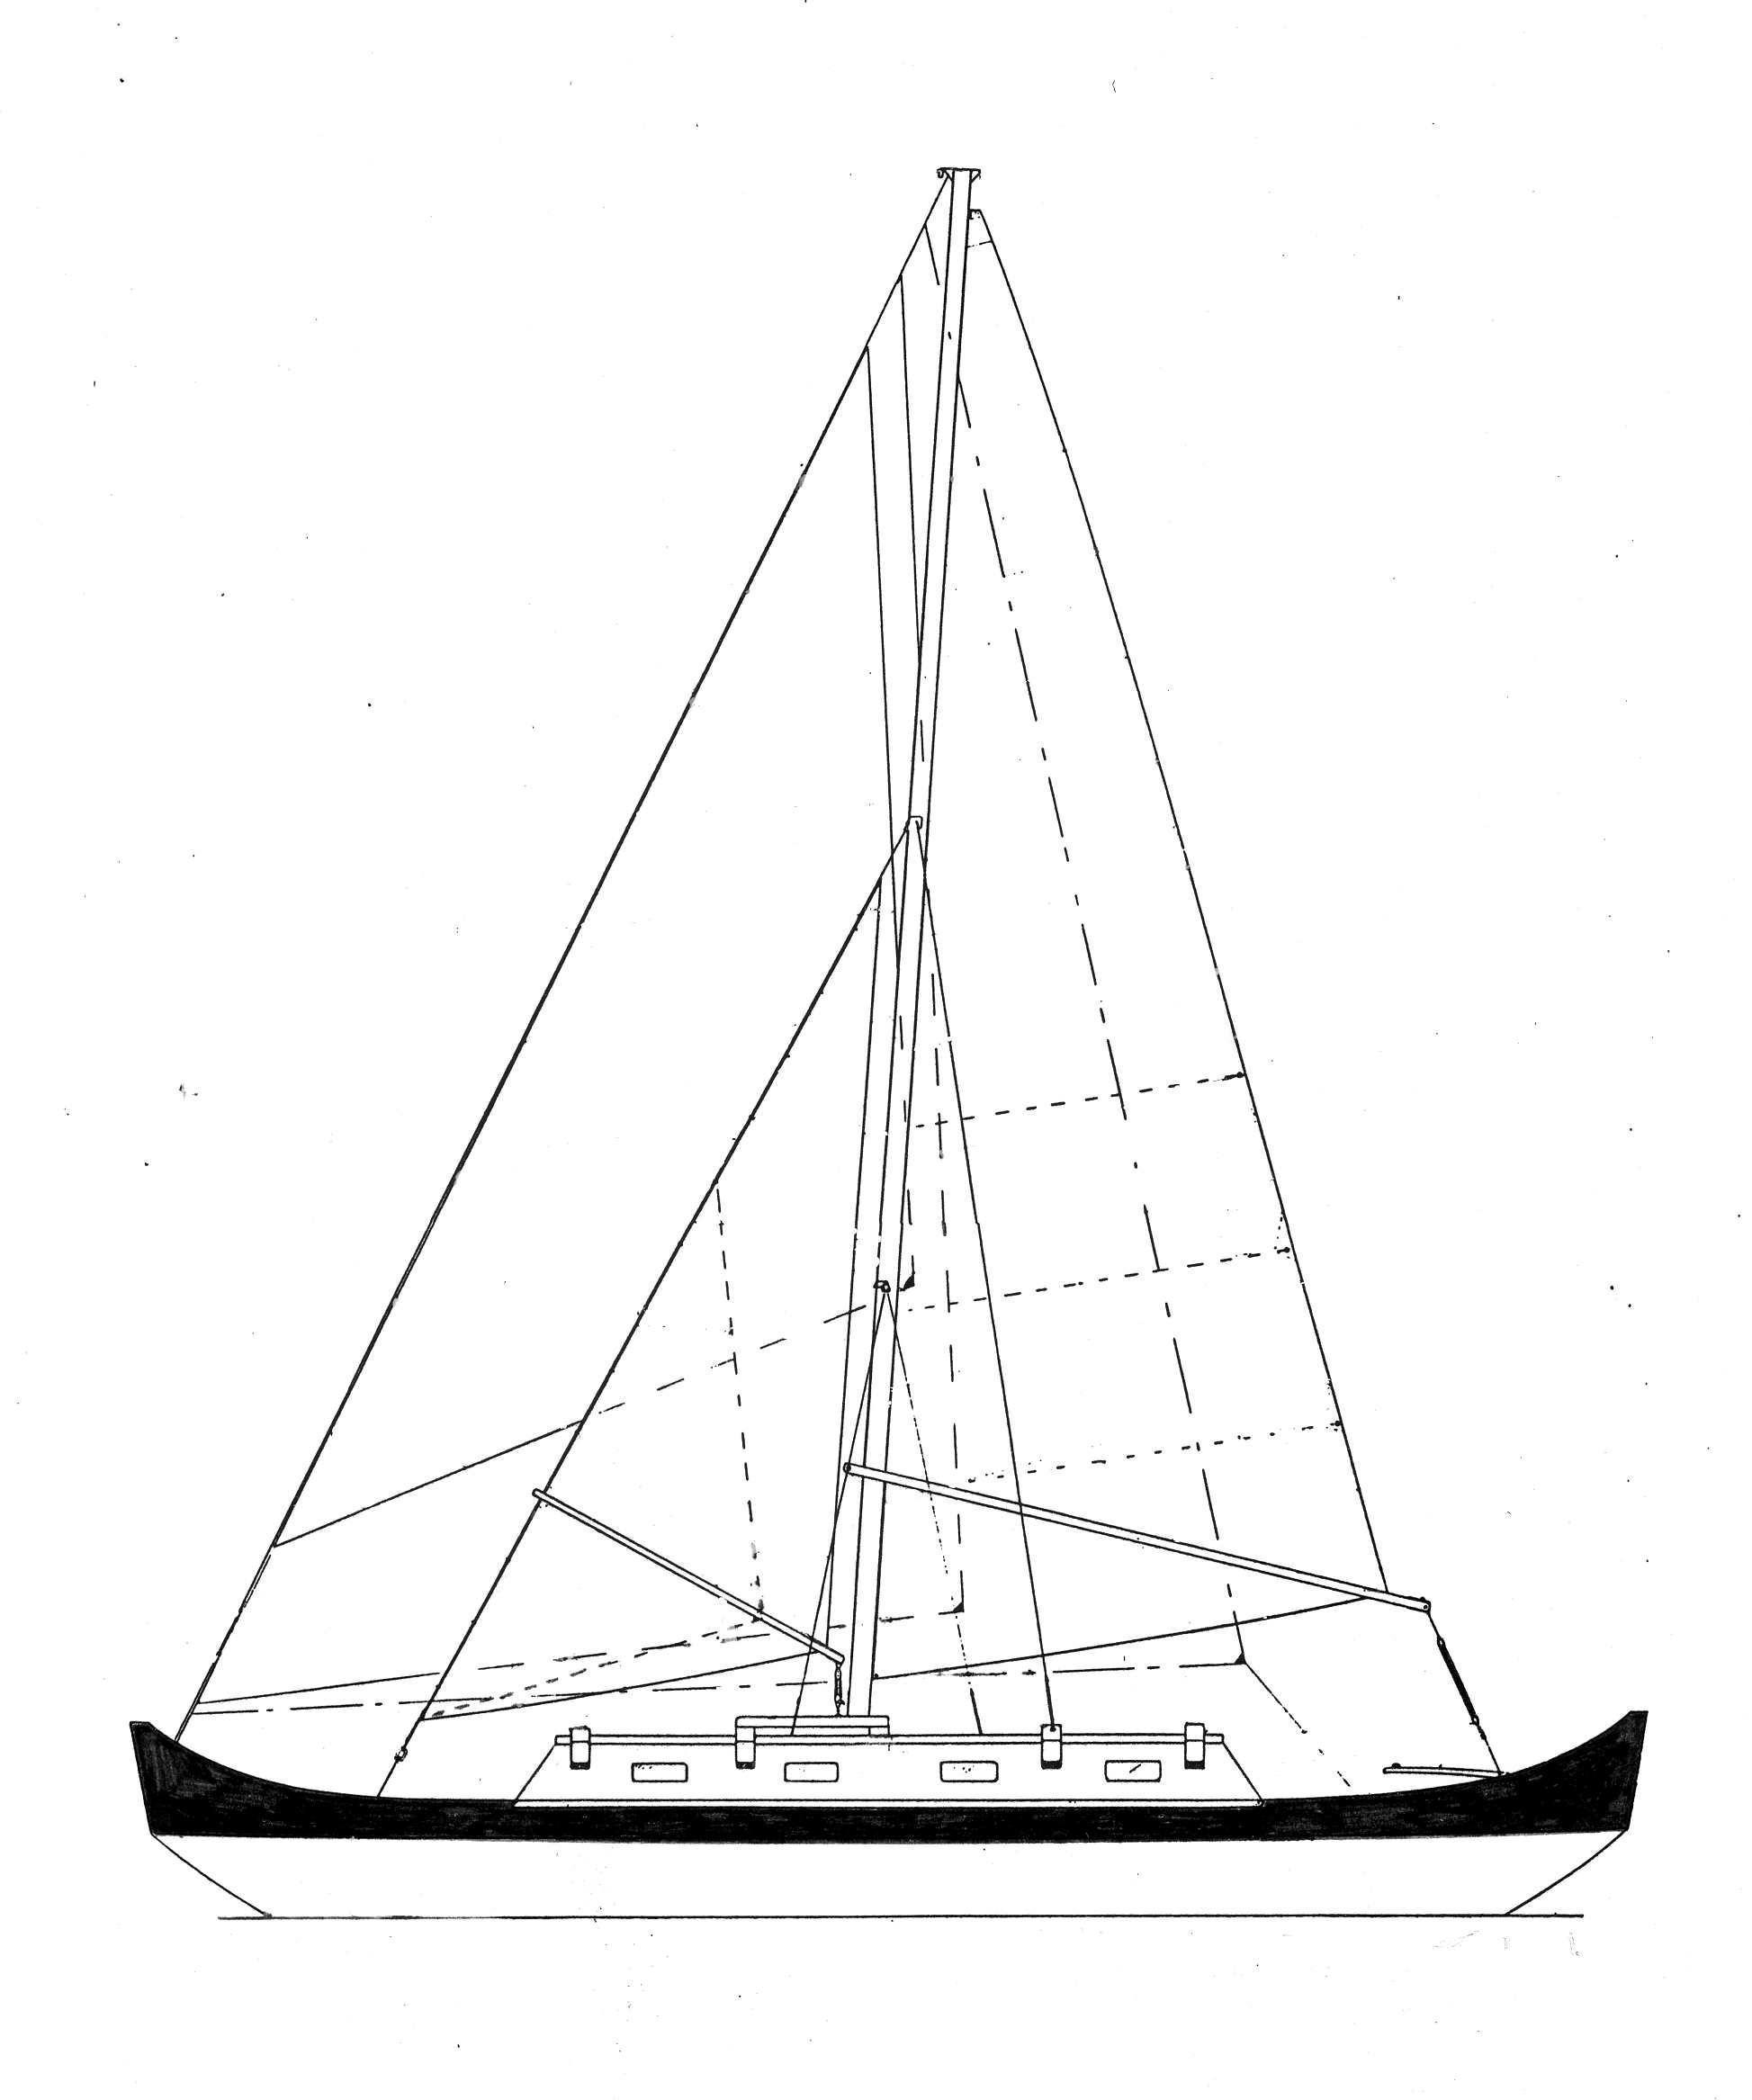 Pahi 42 profile